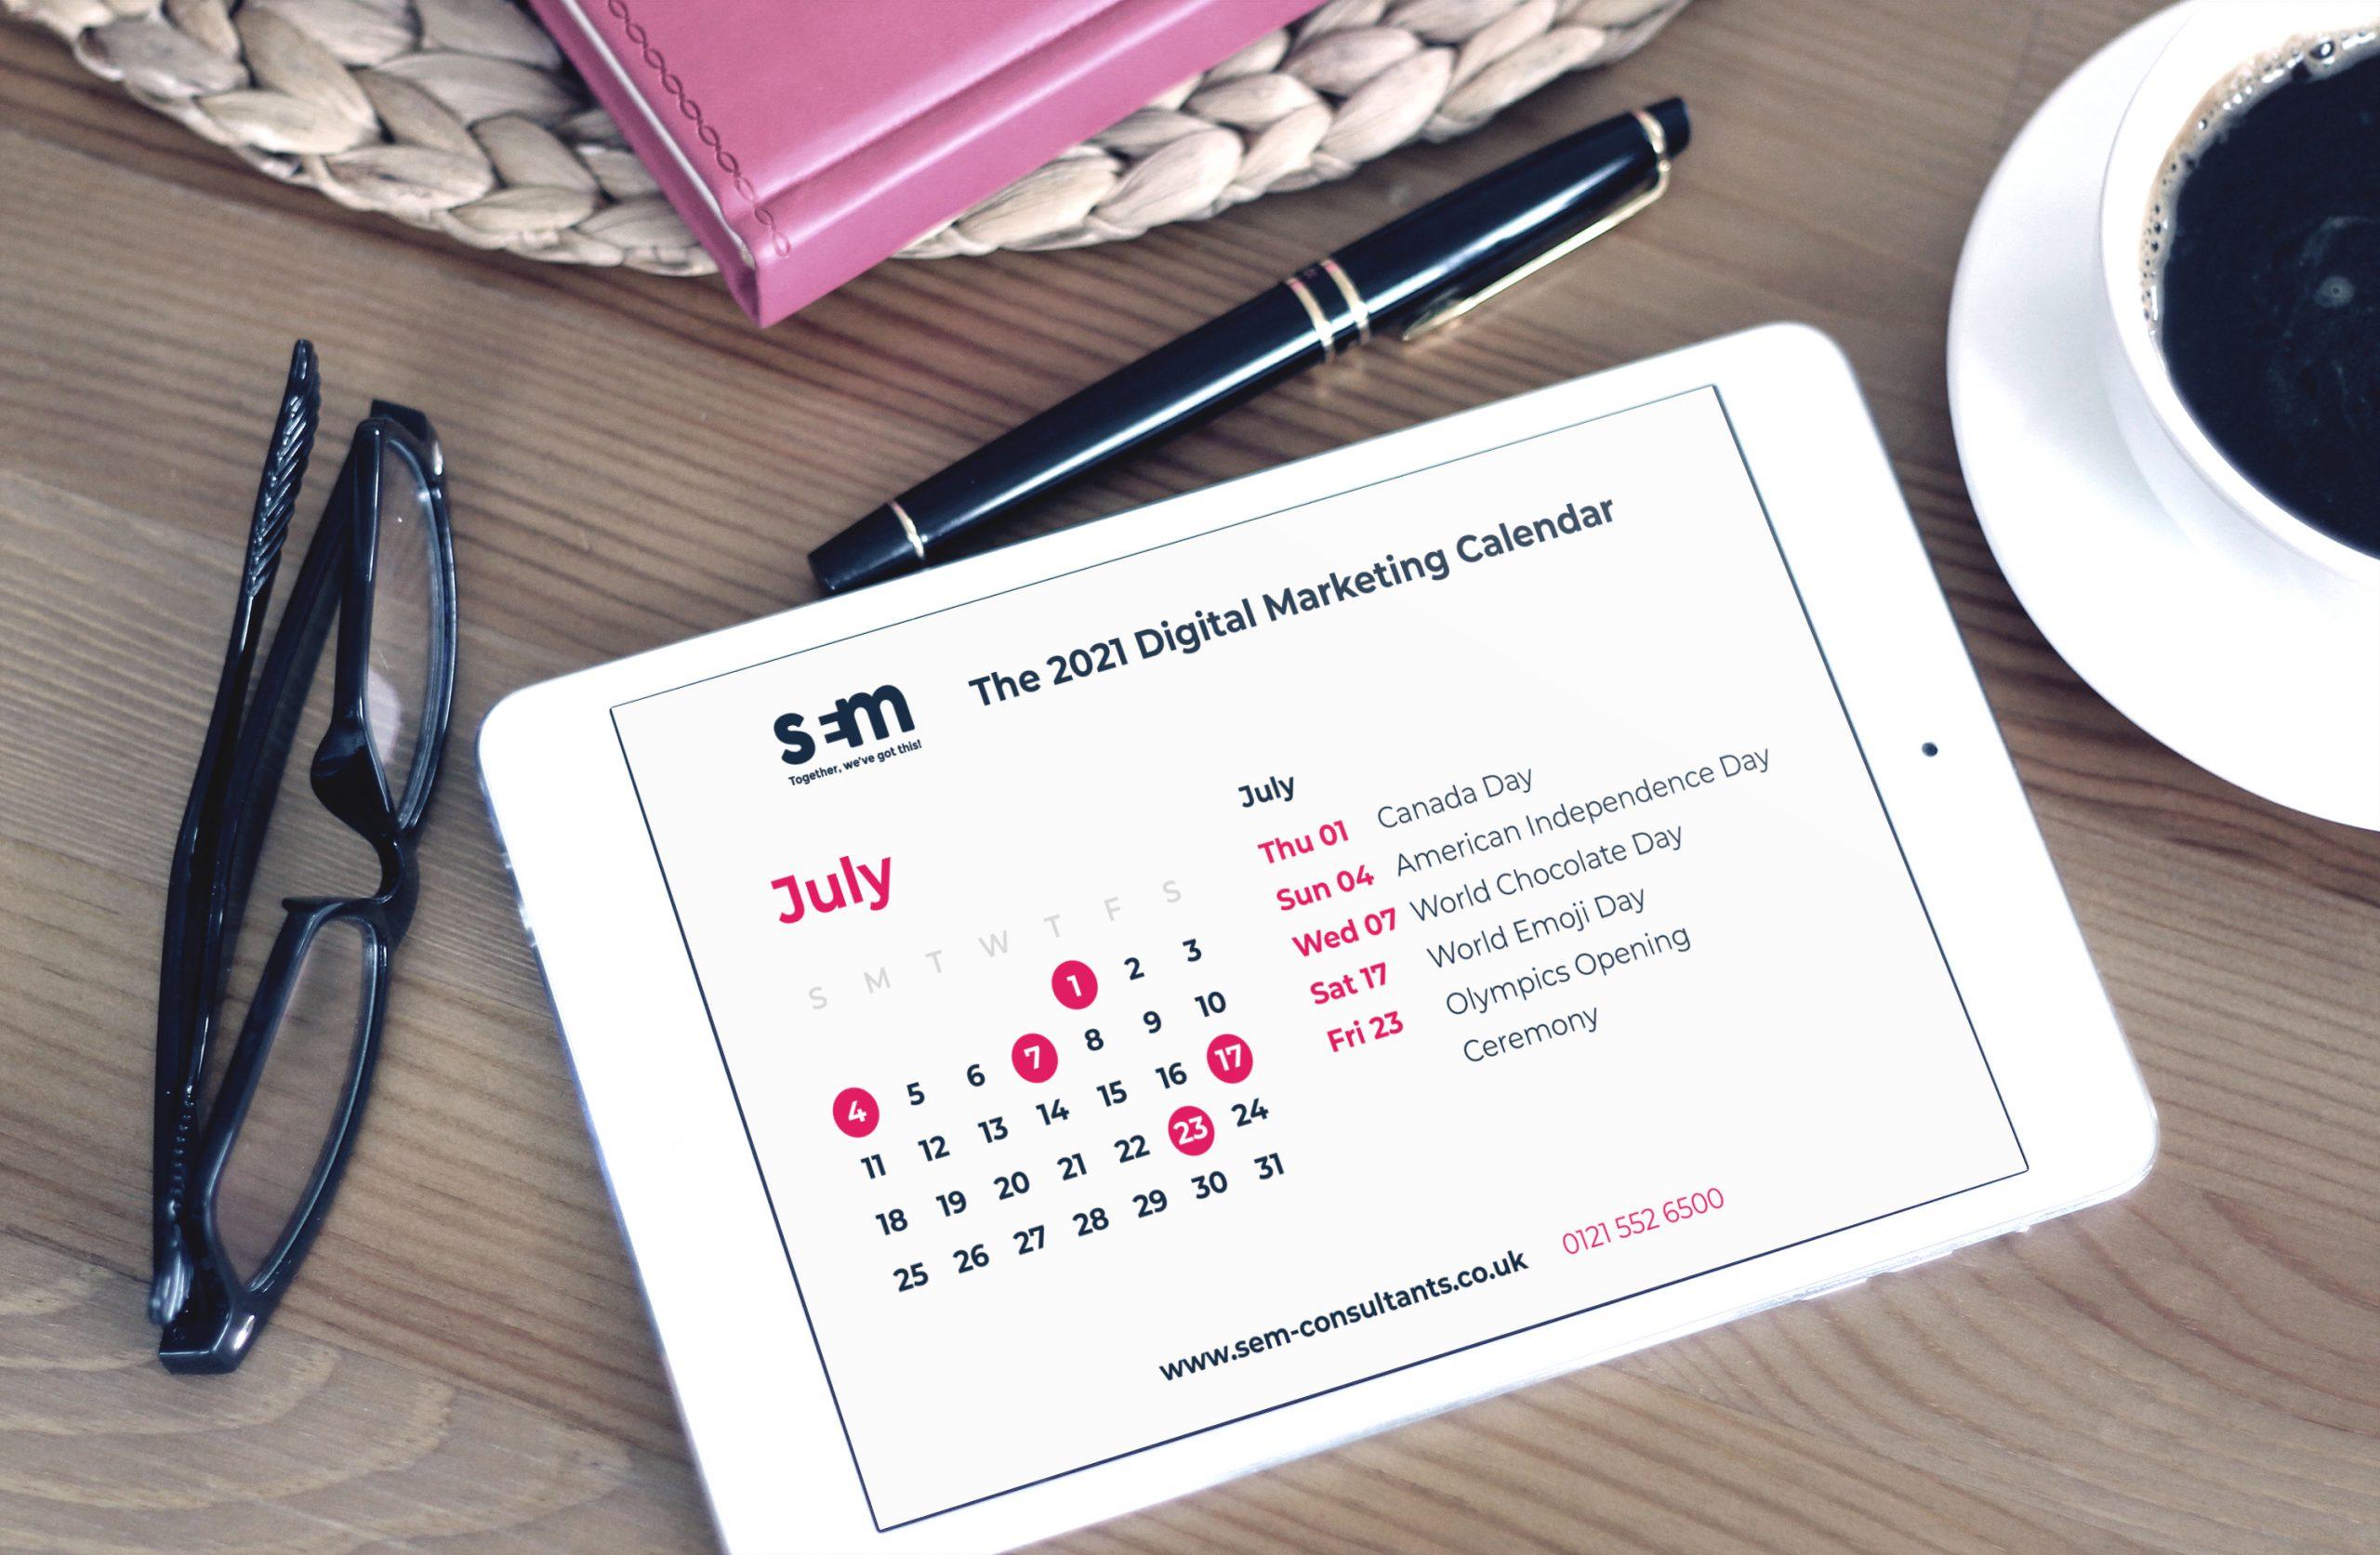 2021 digital marketing calendar